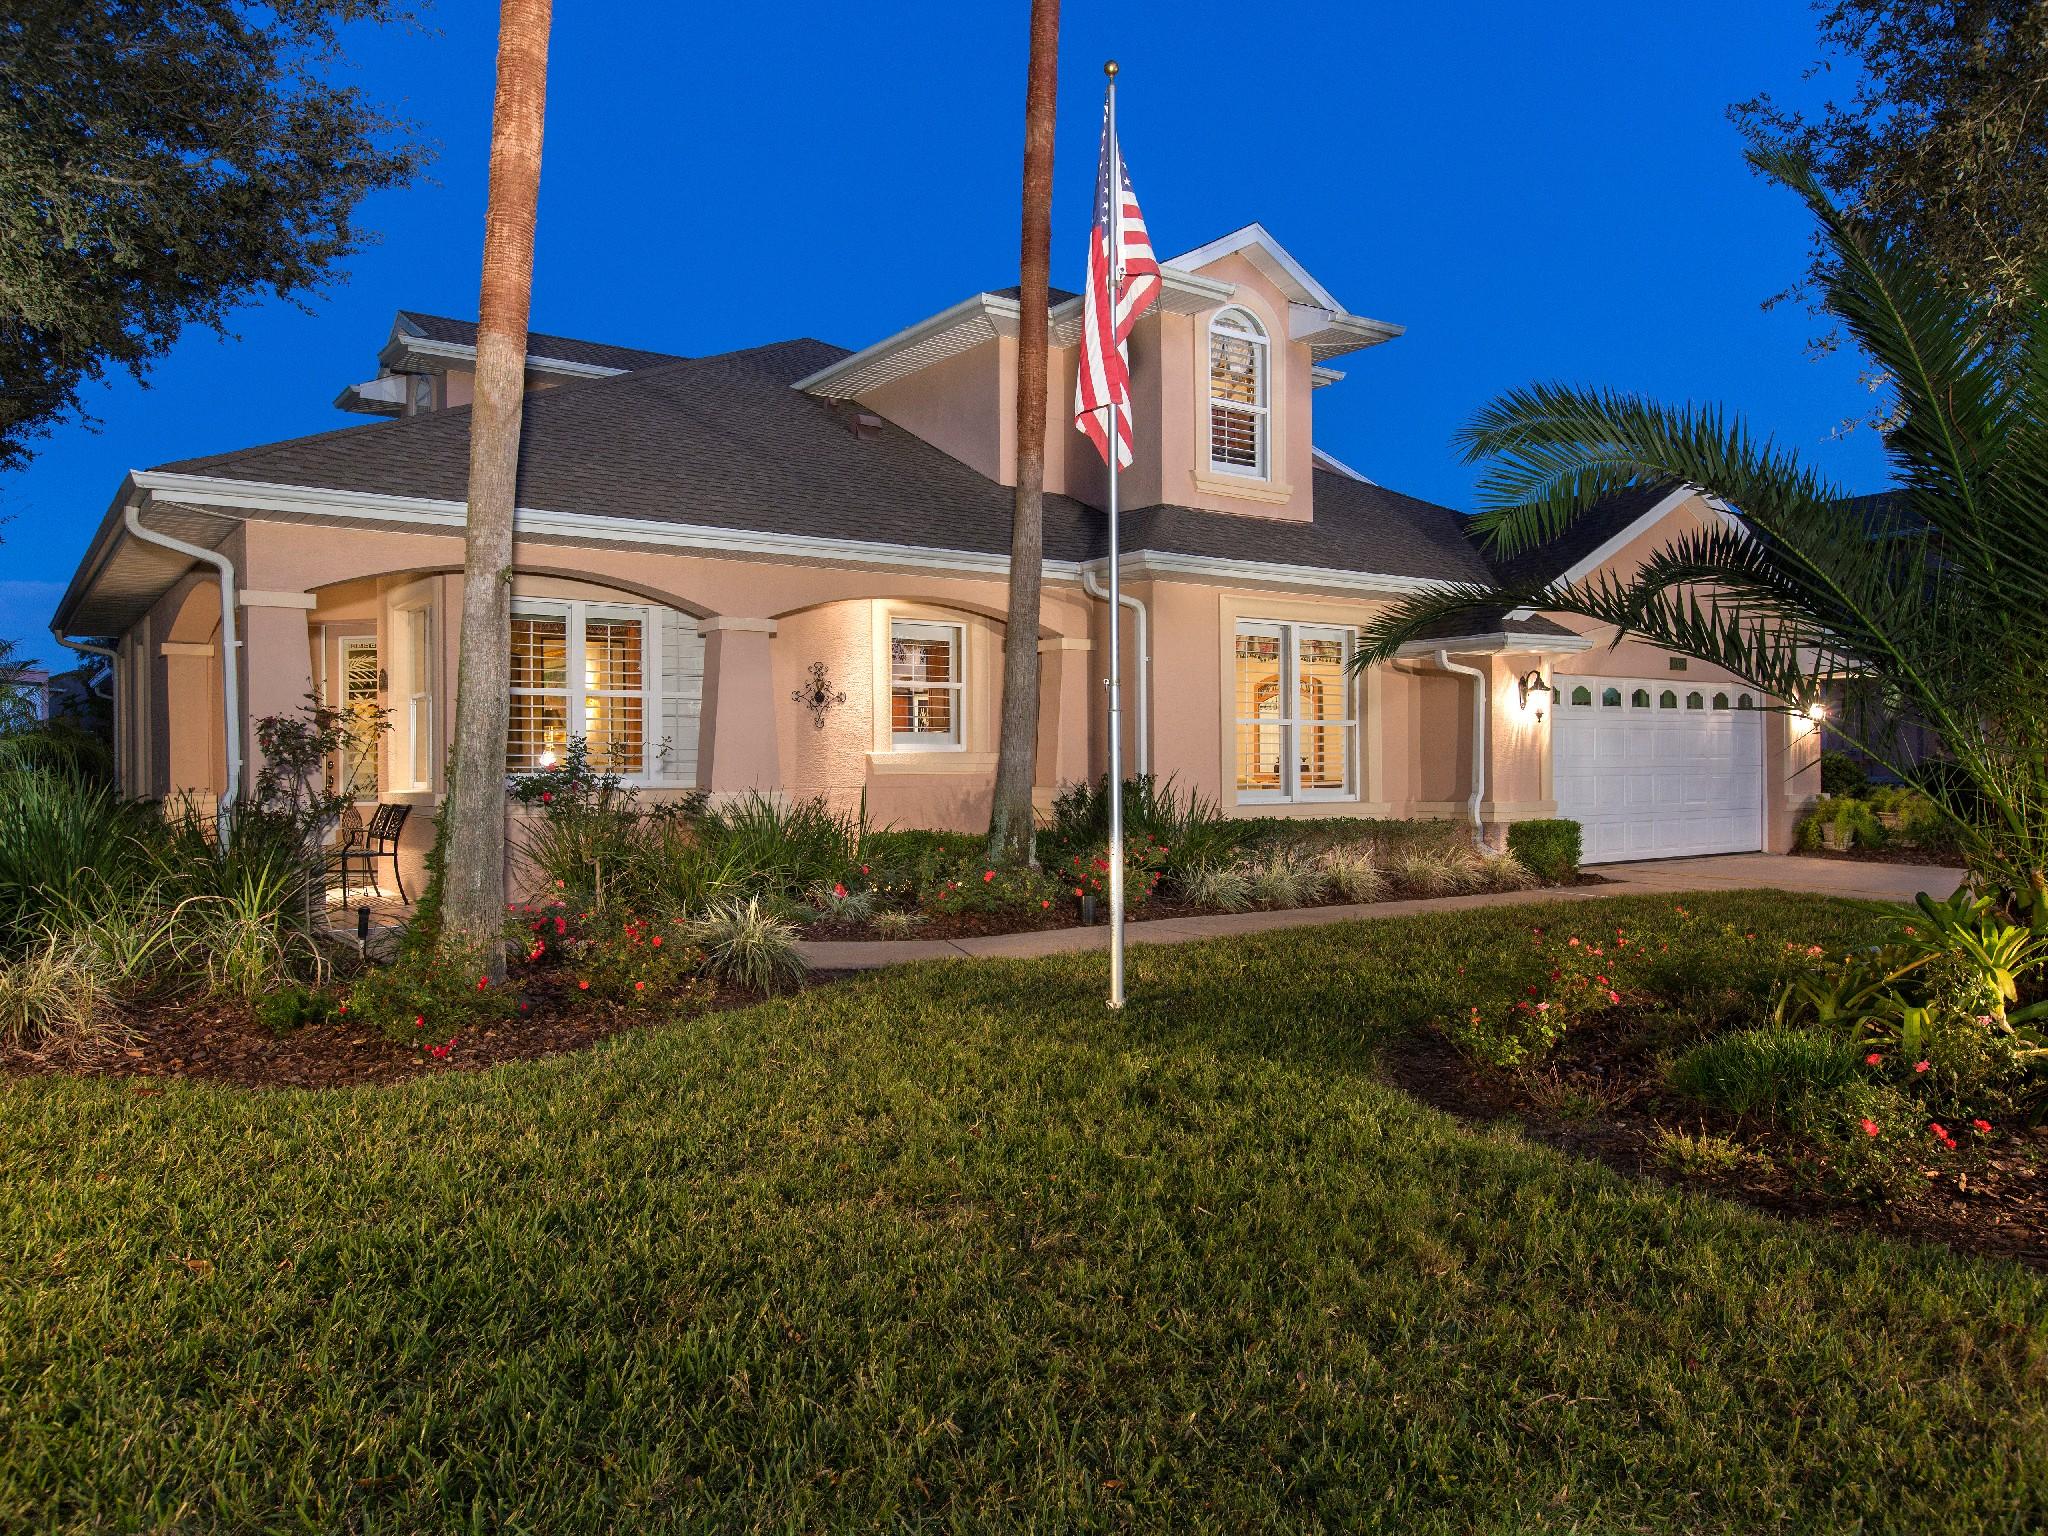 Condominium for Sale at DAYTONA BEACH 1892 Clubhouse Dr 12 Port Orange, Florida 32128 United States